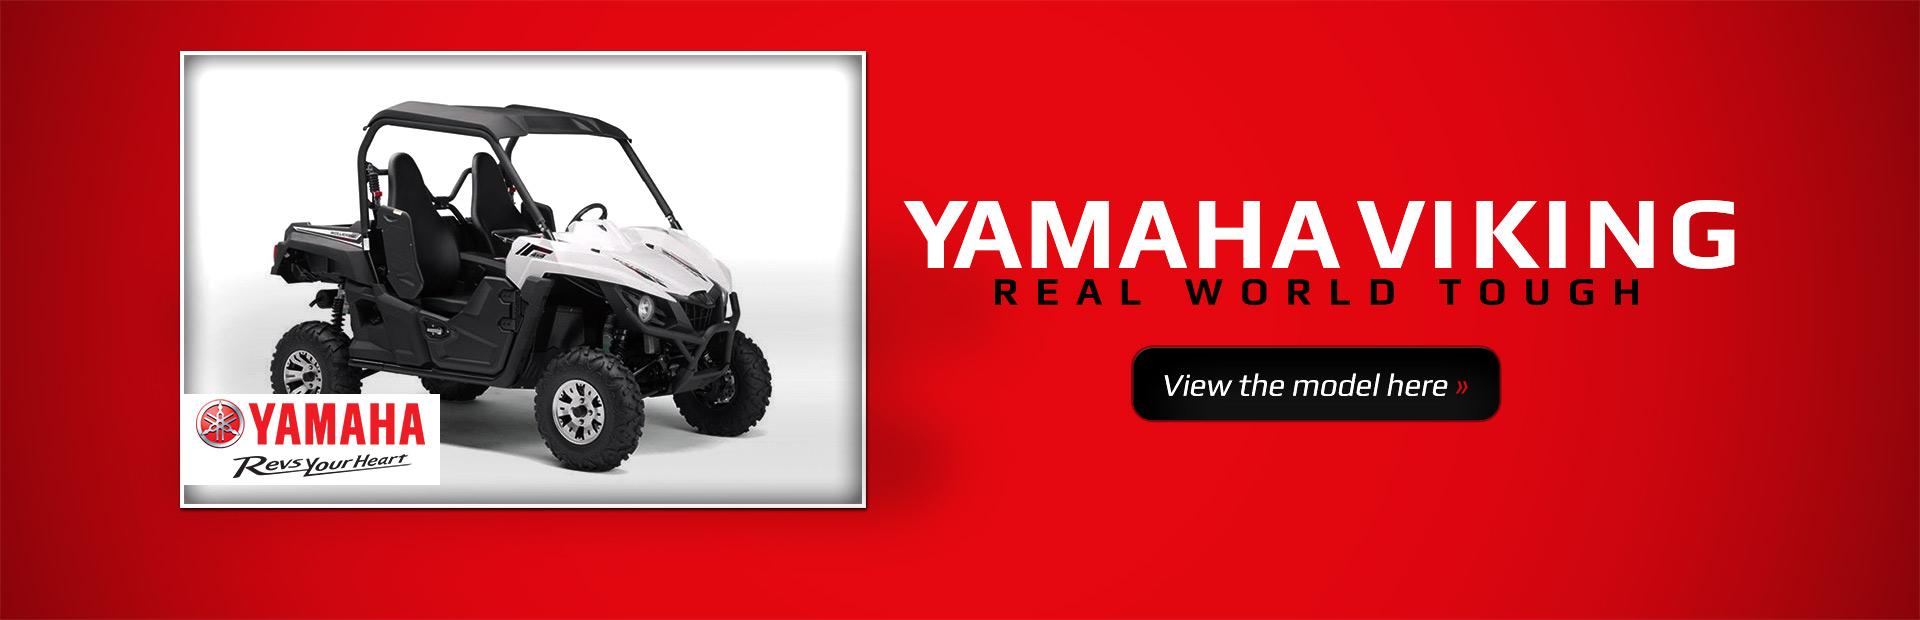 Click here to view the Yamaha Viking.